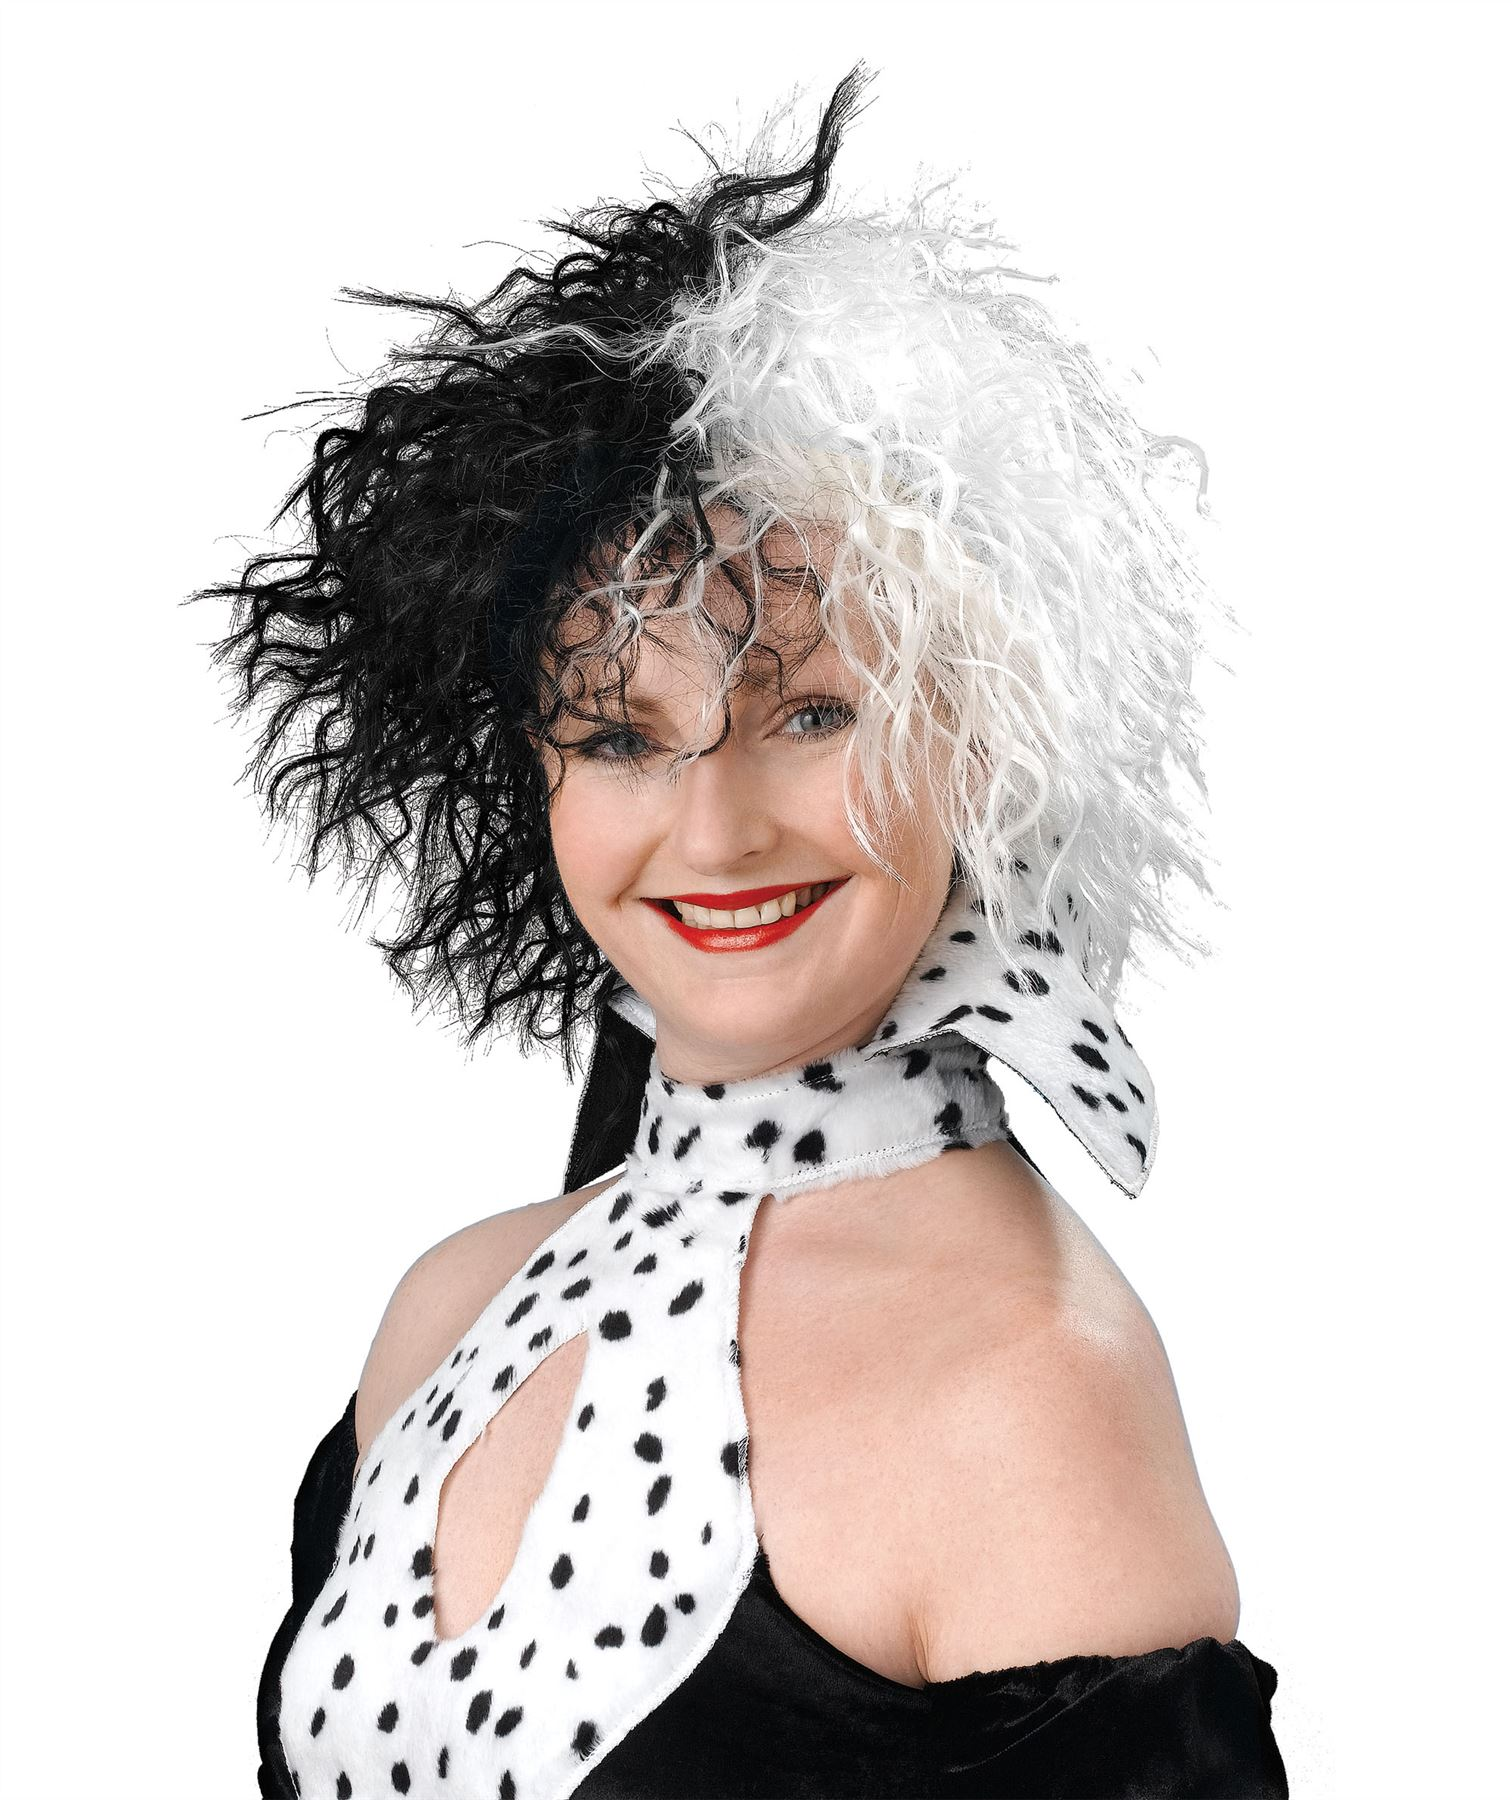 damen kinder cruella dalmatiner b chertag b sewicht kost m zubeh r outfit menge ebay. Black Bedroom Furniture Sets. Home Design Ideas